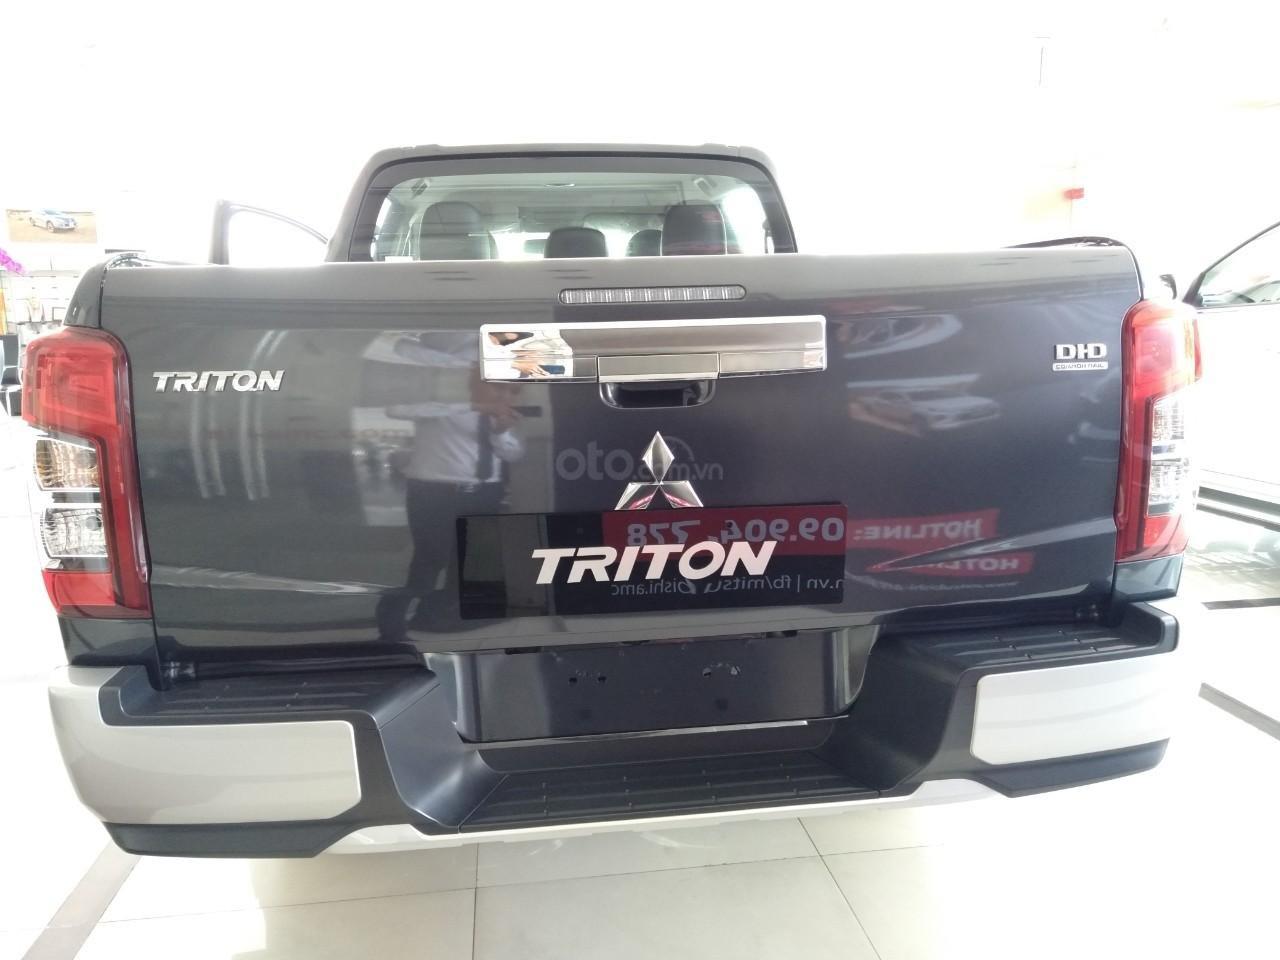 Nhanh tay sở hữu Mitsubishi Triton New 2019-3